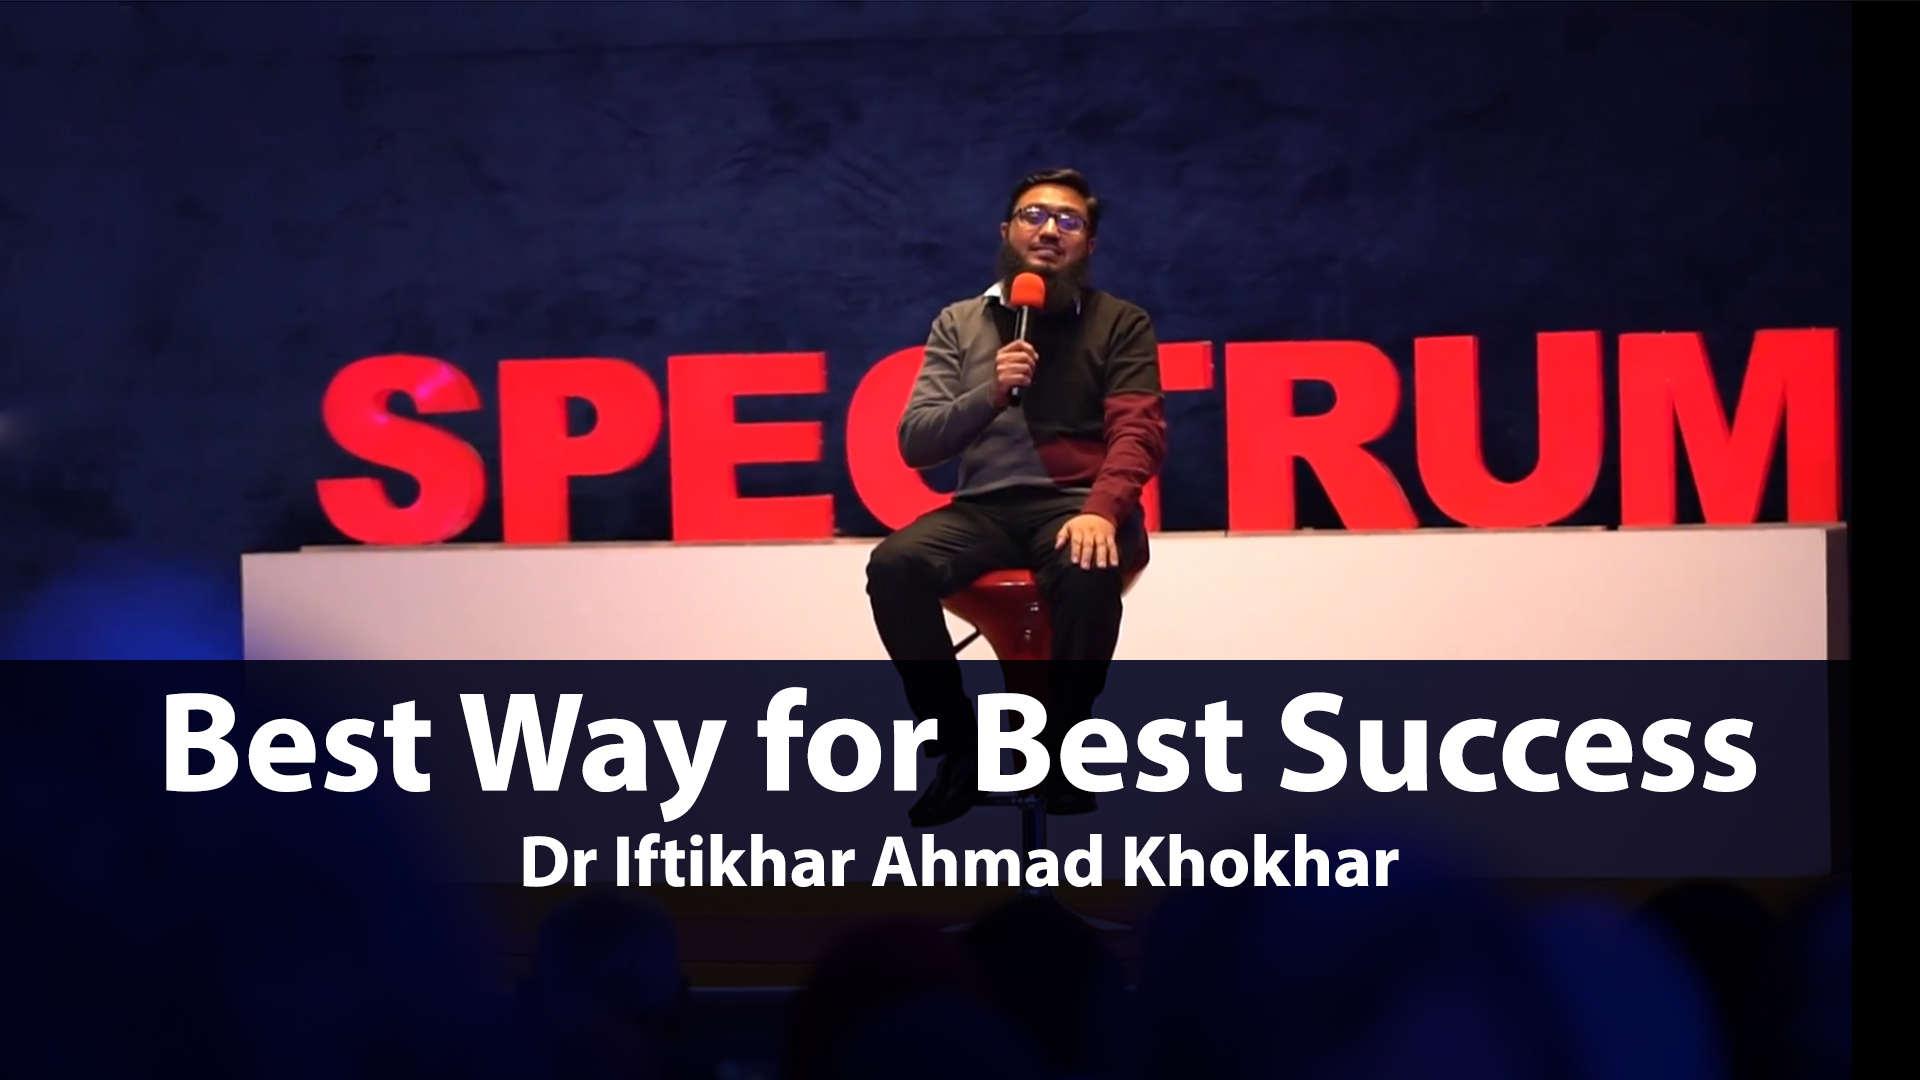 Best Way for Best Success